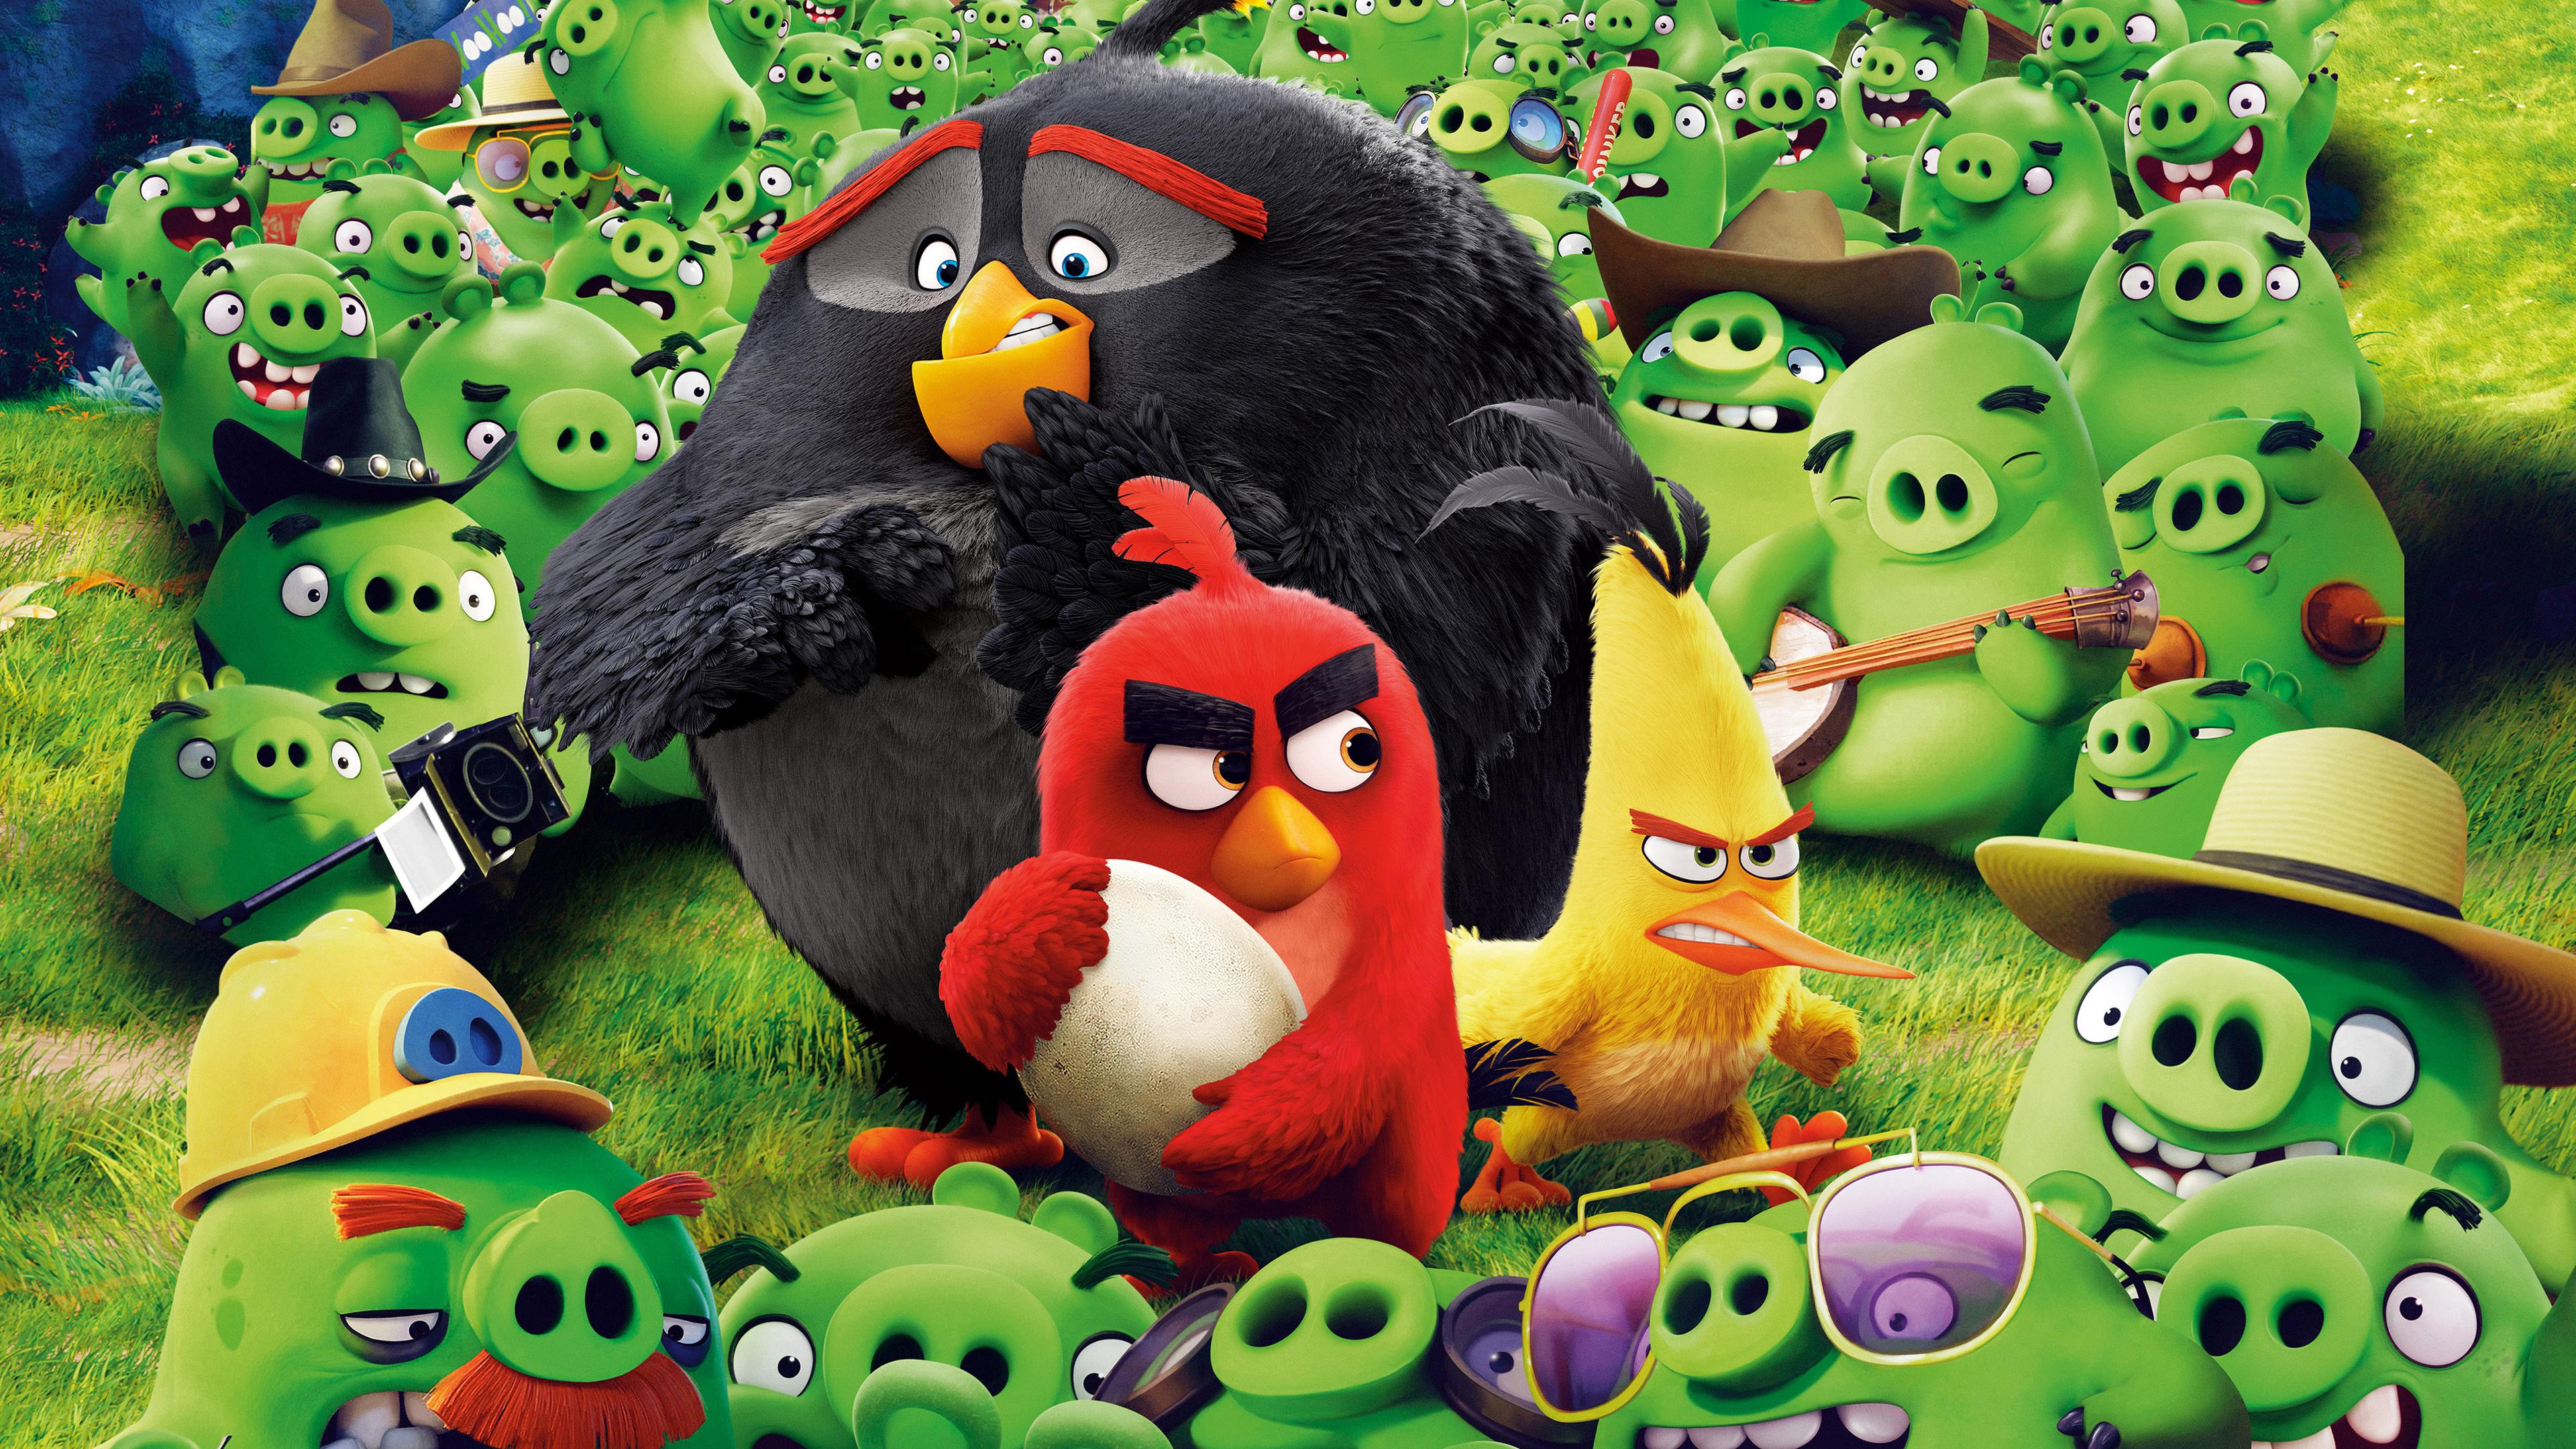 angry birds save the egg 4k 1555208799 - Angry Birds Save The Egg 4k - the angry birds movie wallpapers, movies wallpapers, hd-wallpapers, birds wallpapers, animated movies wallpapers, angry birds wallpapers, 4k-wallpapers